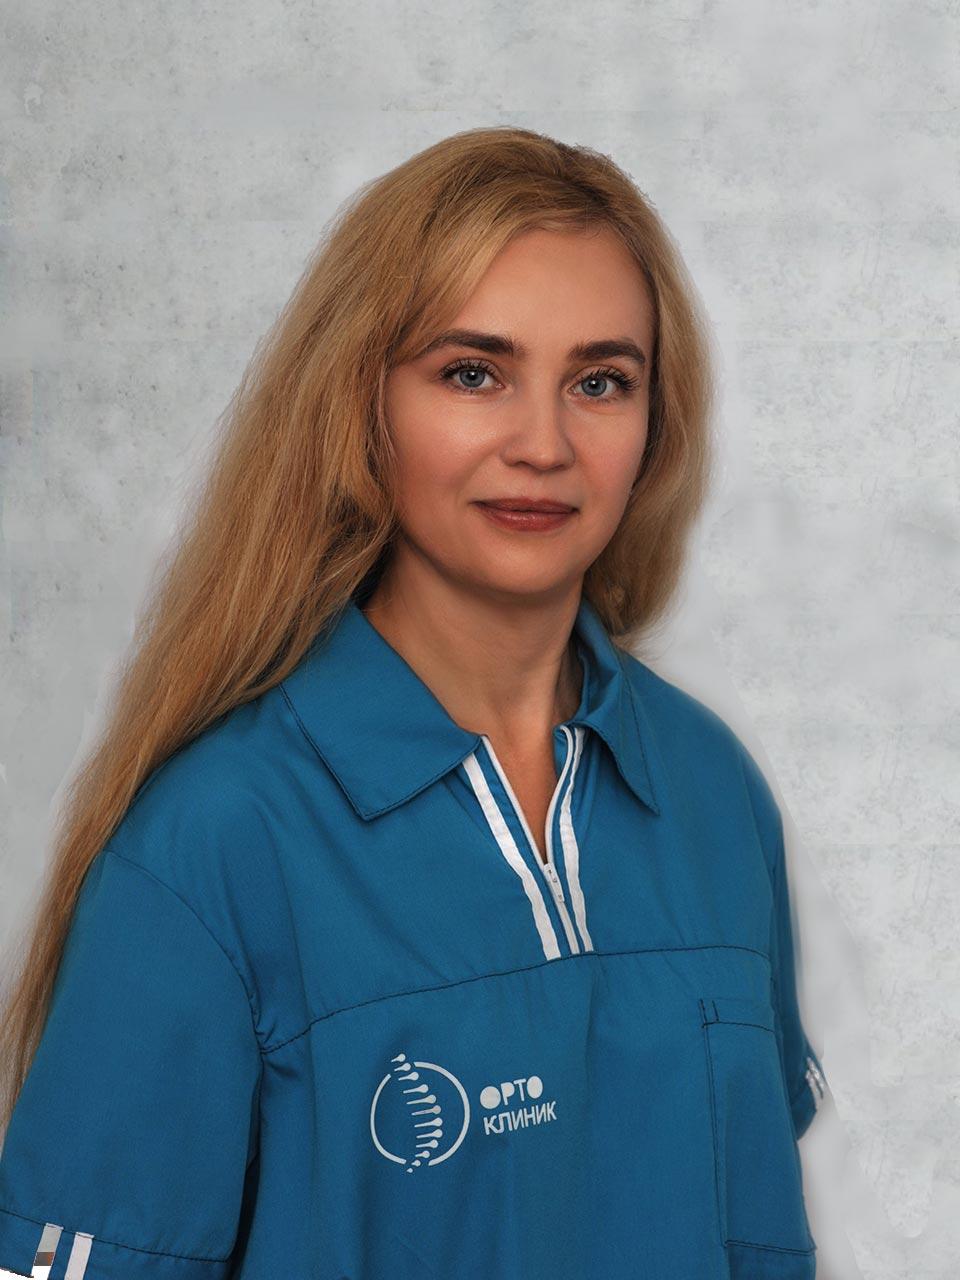 Врач Темляк Лариса Николаевна